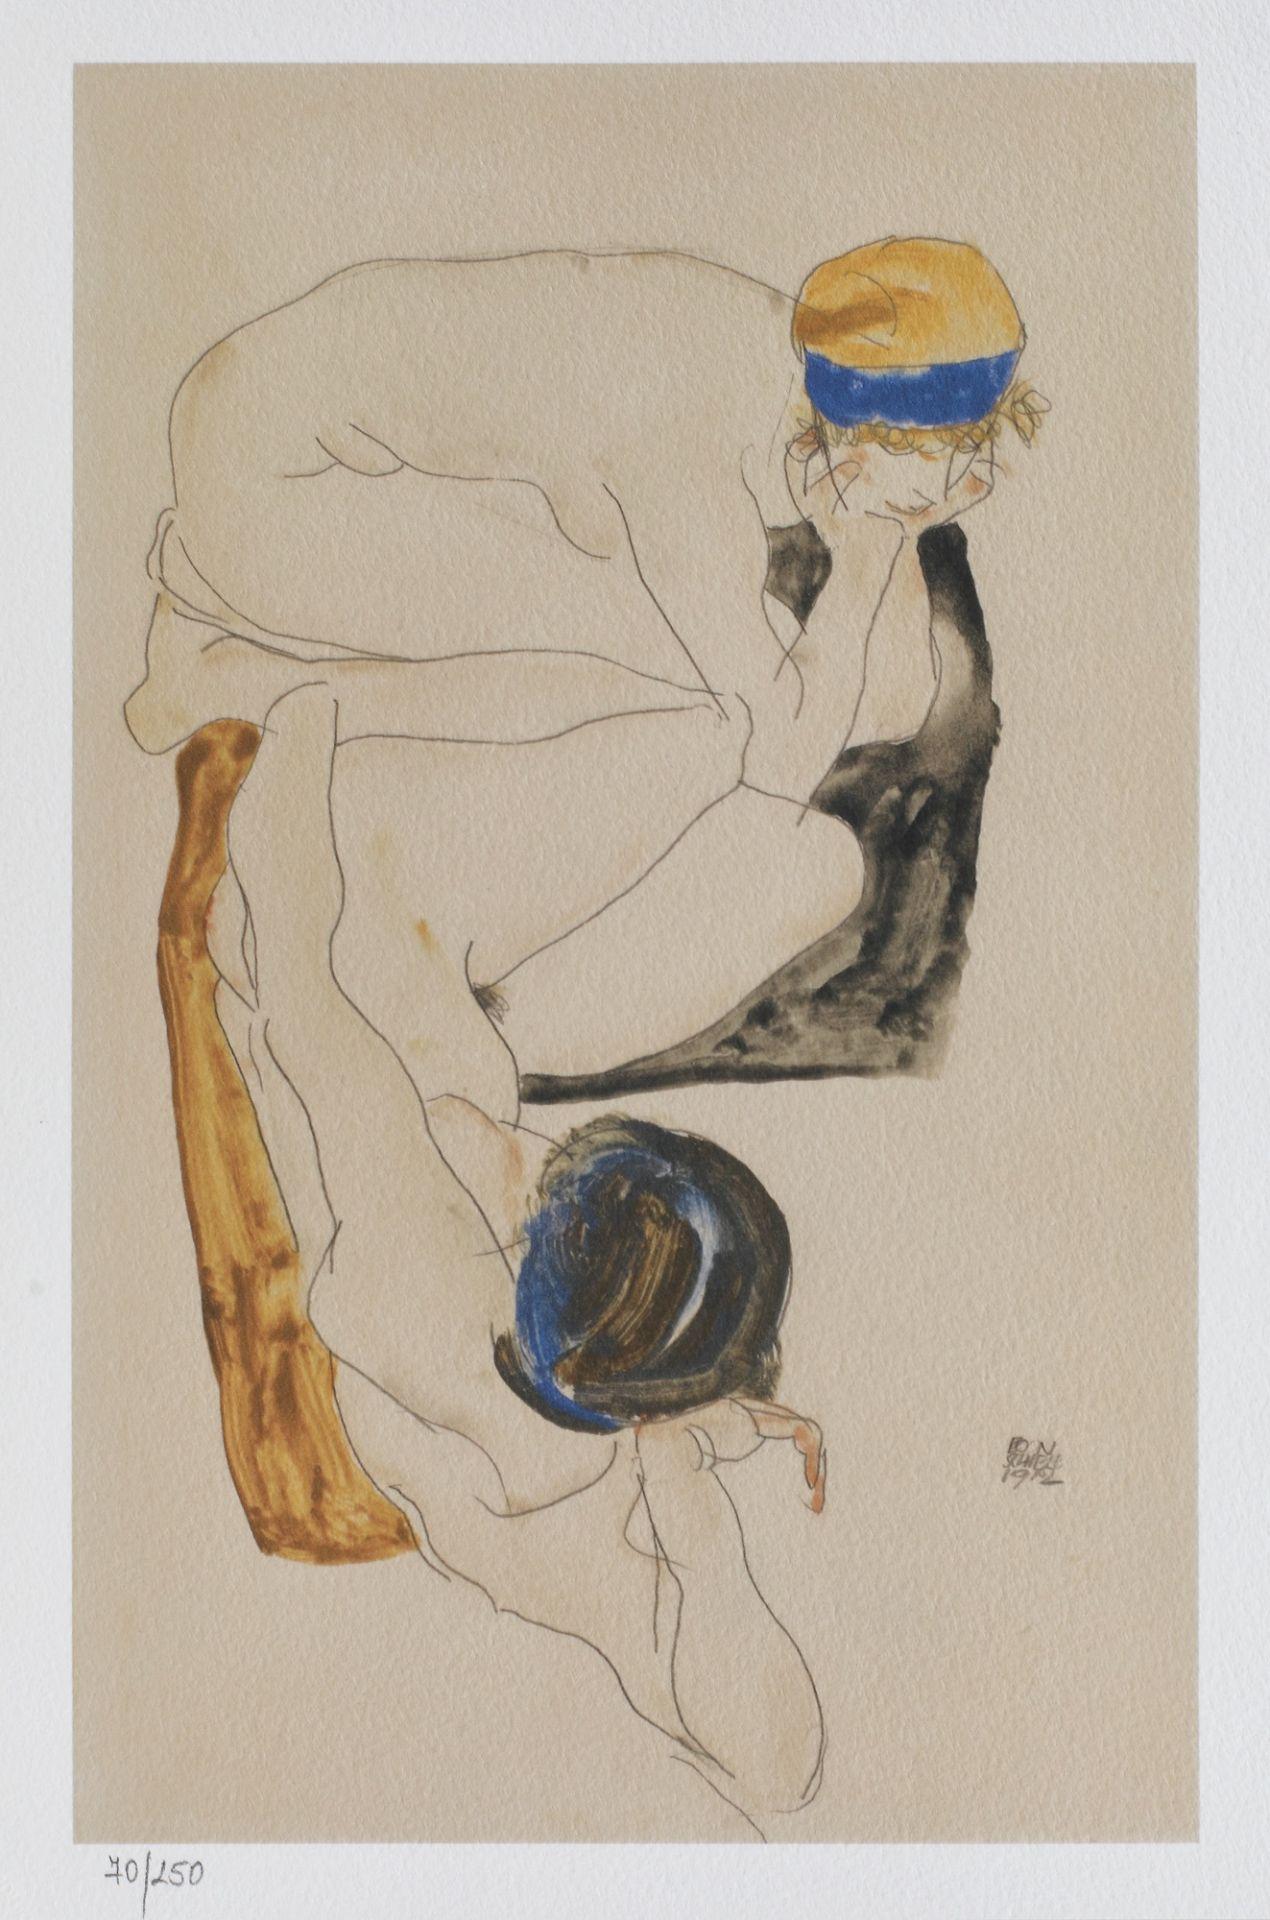 Egon Schiele, Two Reclining FiguresEgon Schiele, Two Reclining Figures, chromolithography, 28,5